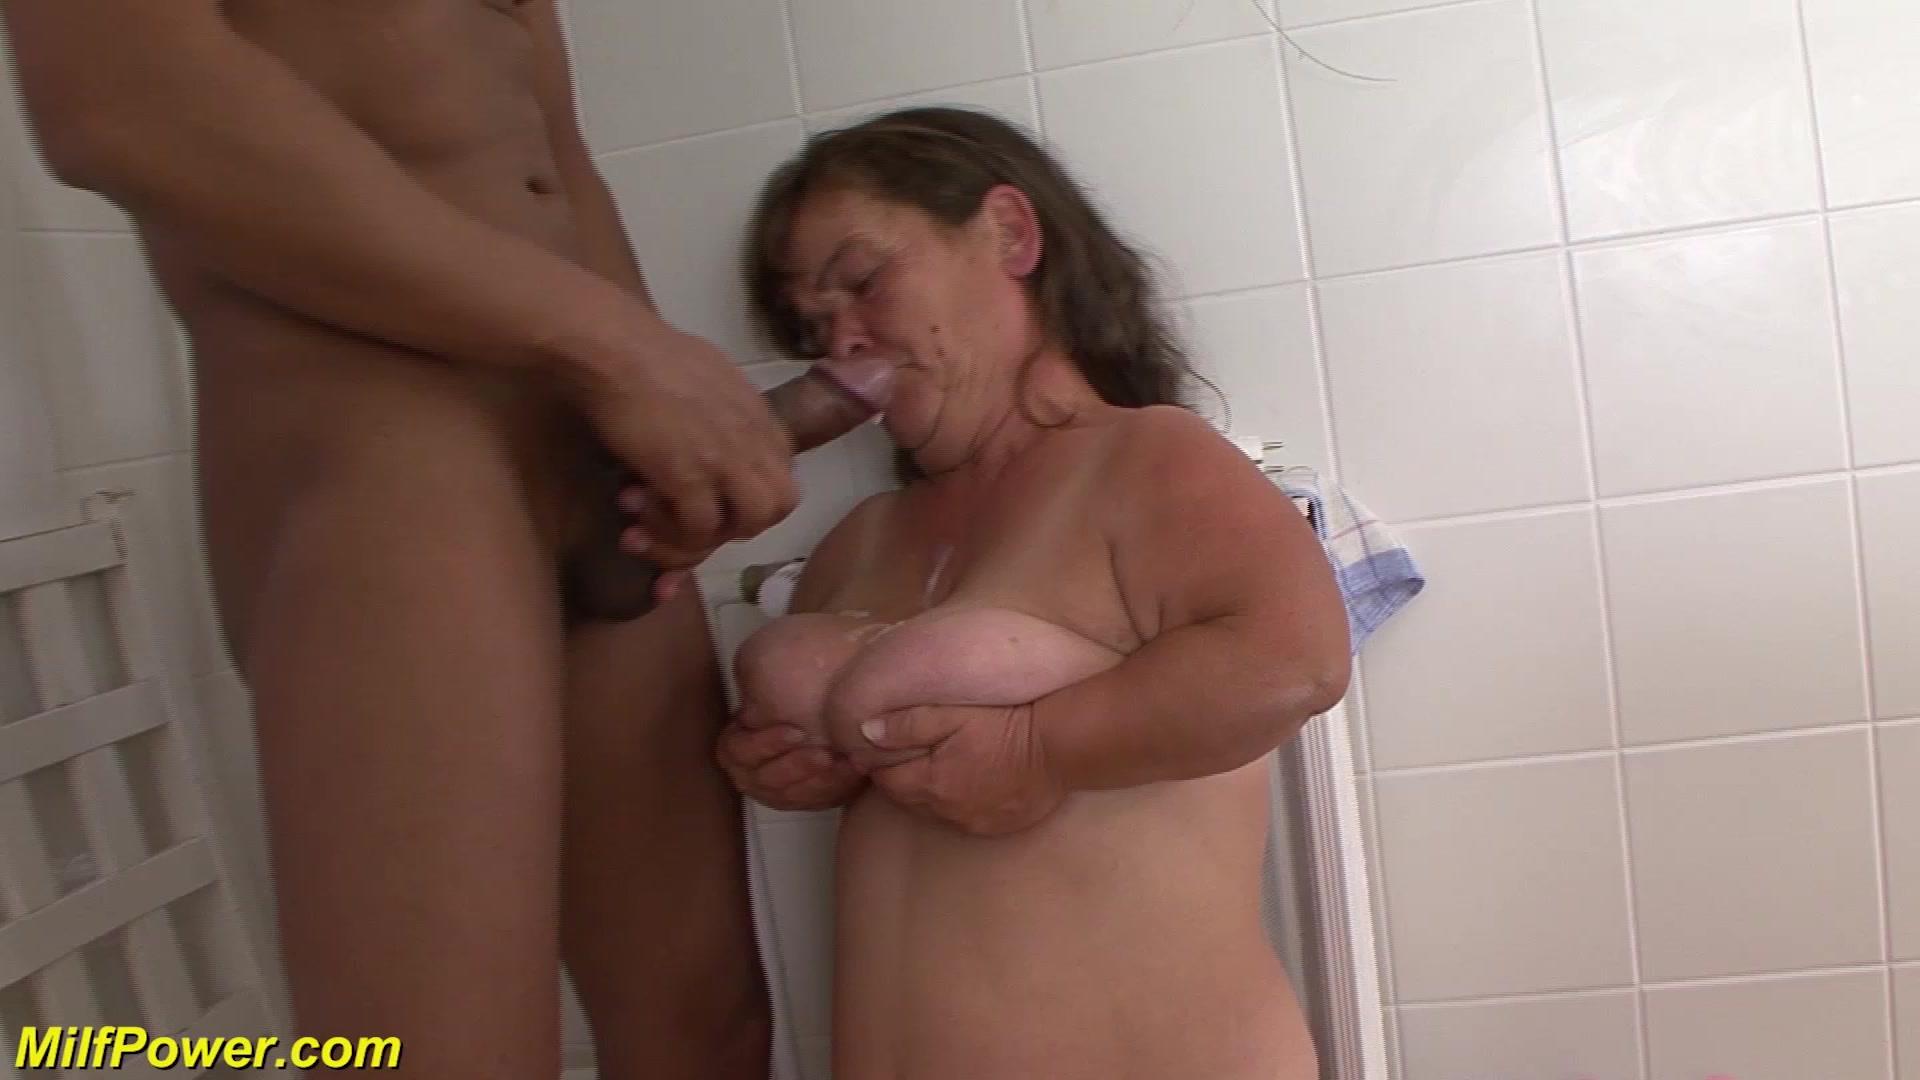 Naked prego punishment pics